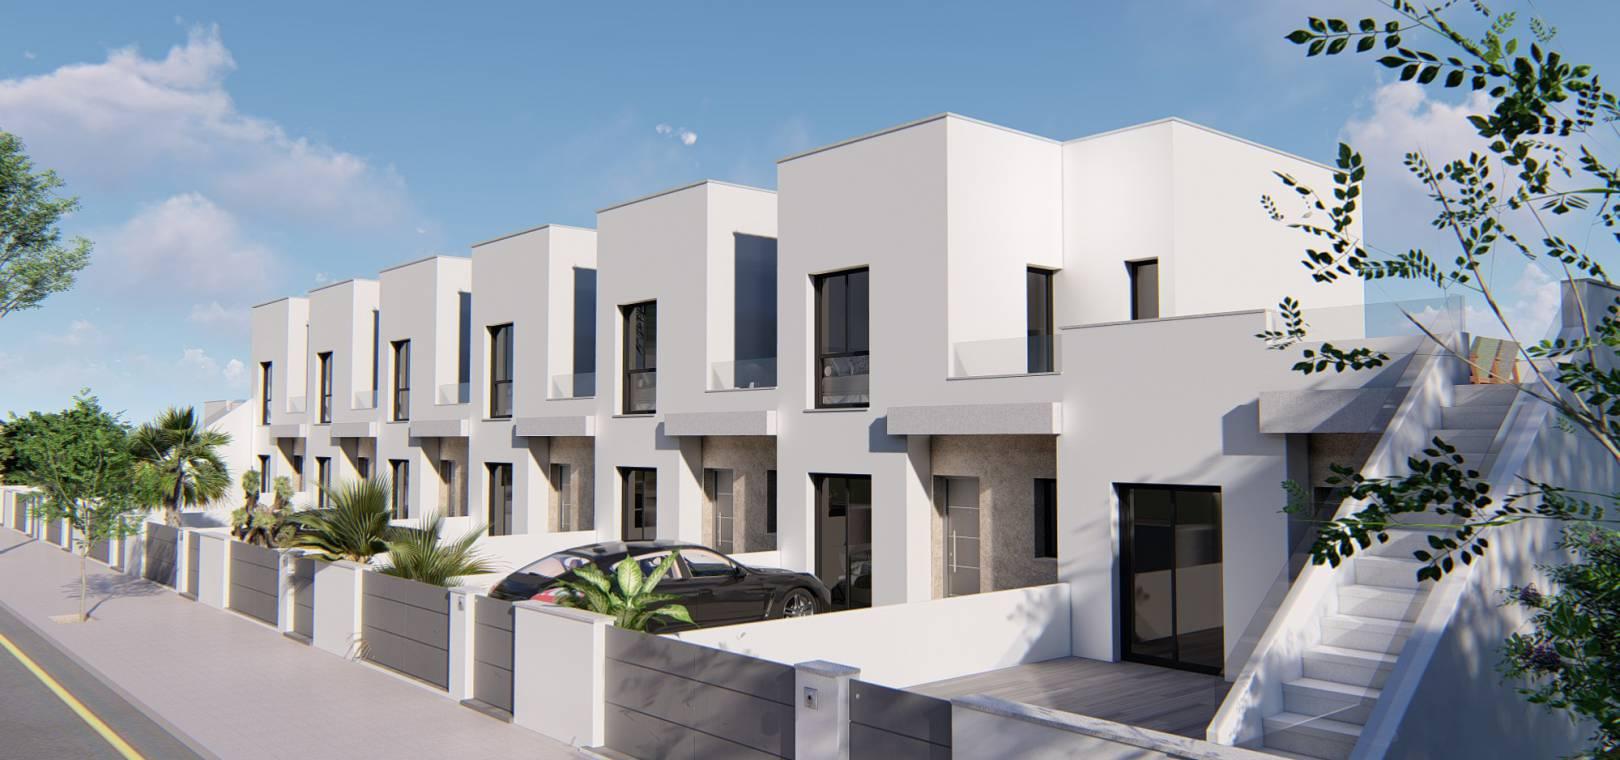 Pilar_de_la_Horadada_New_Build_Properties_For_Sale_nsp259_5